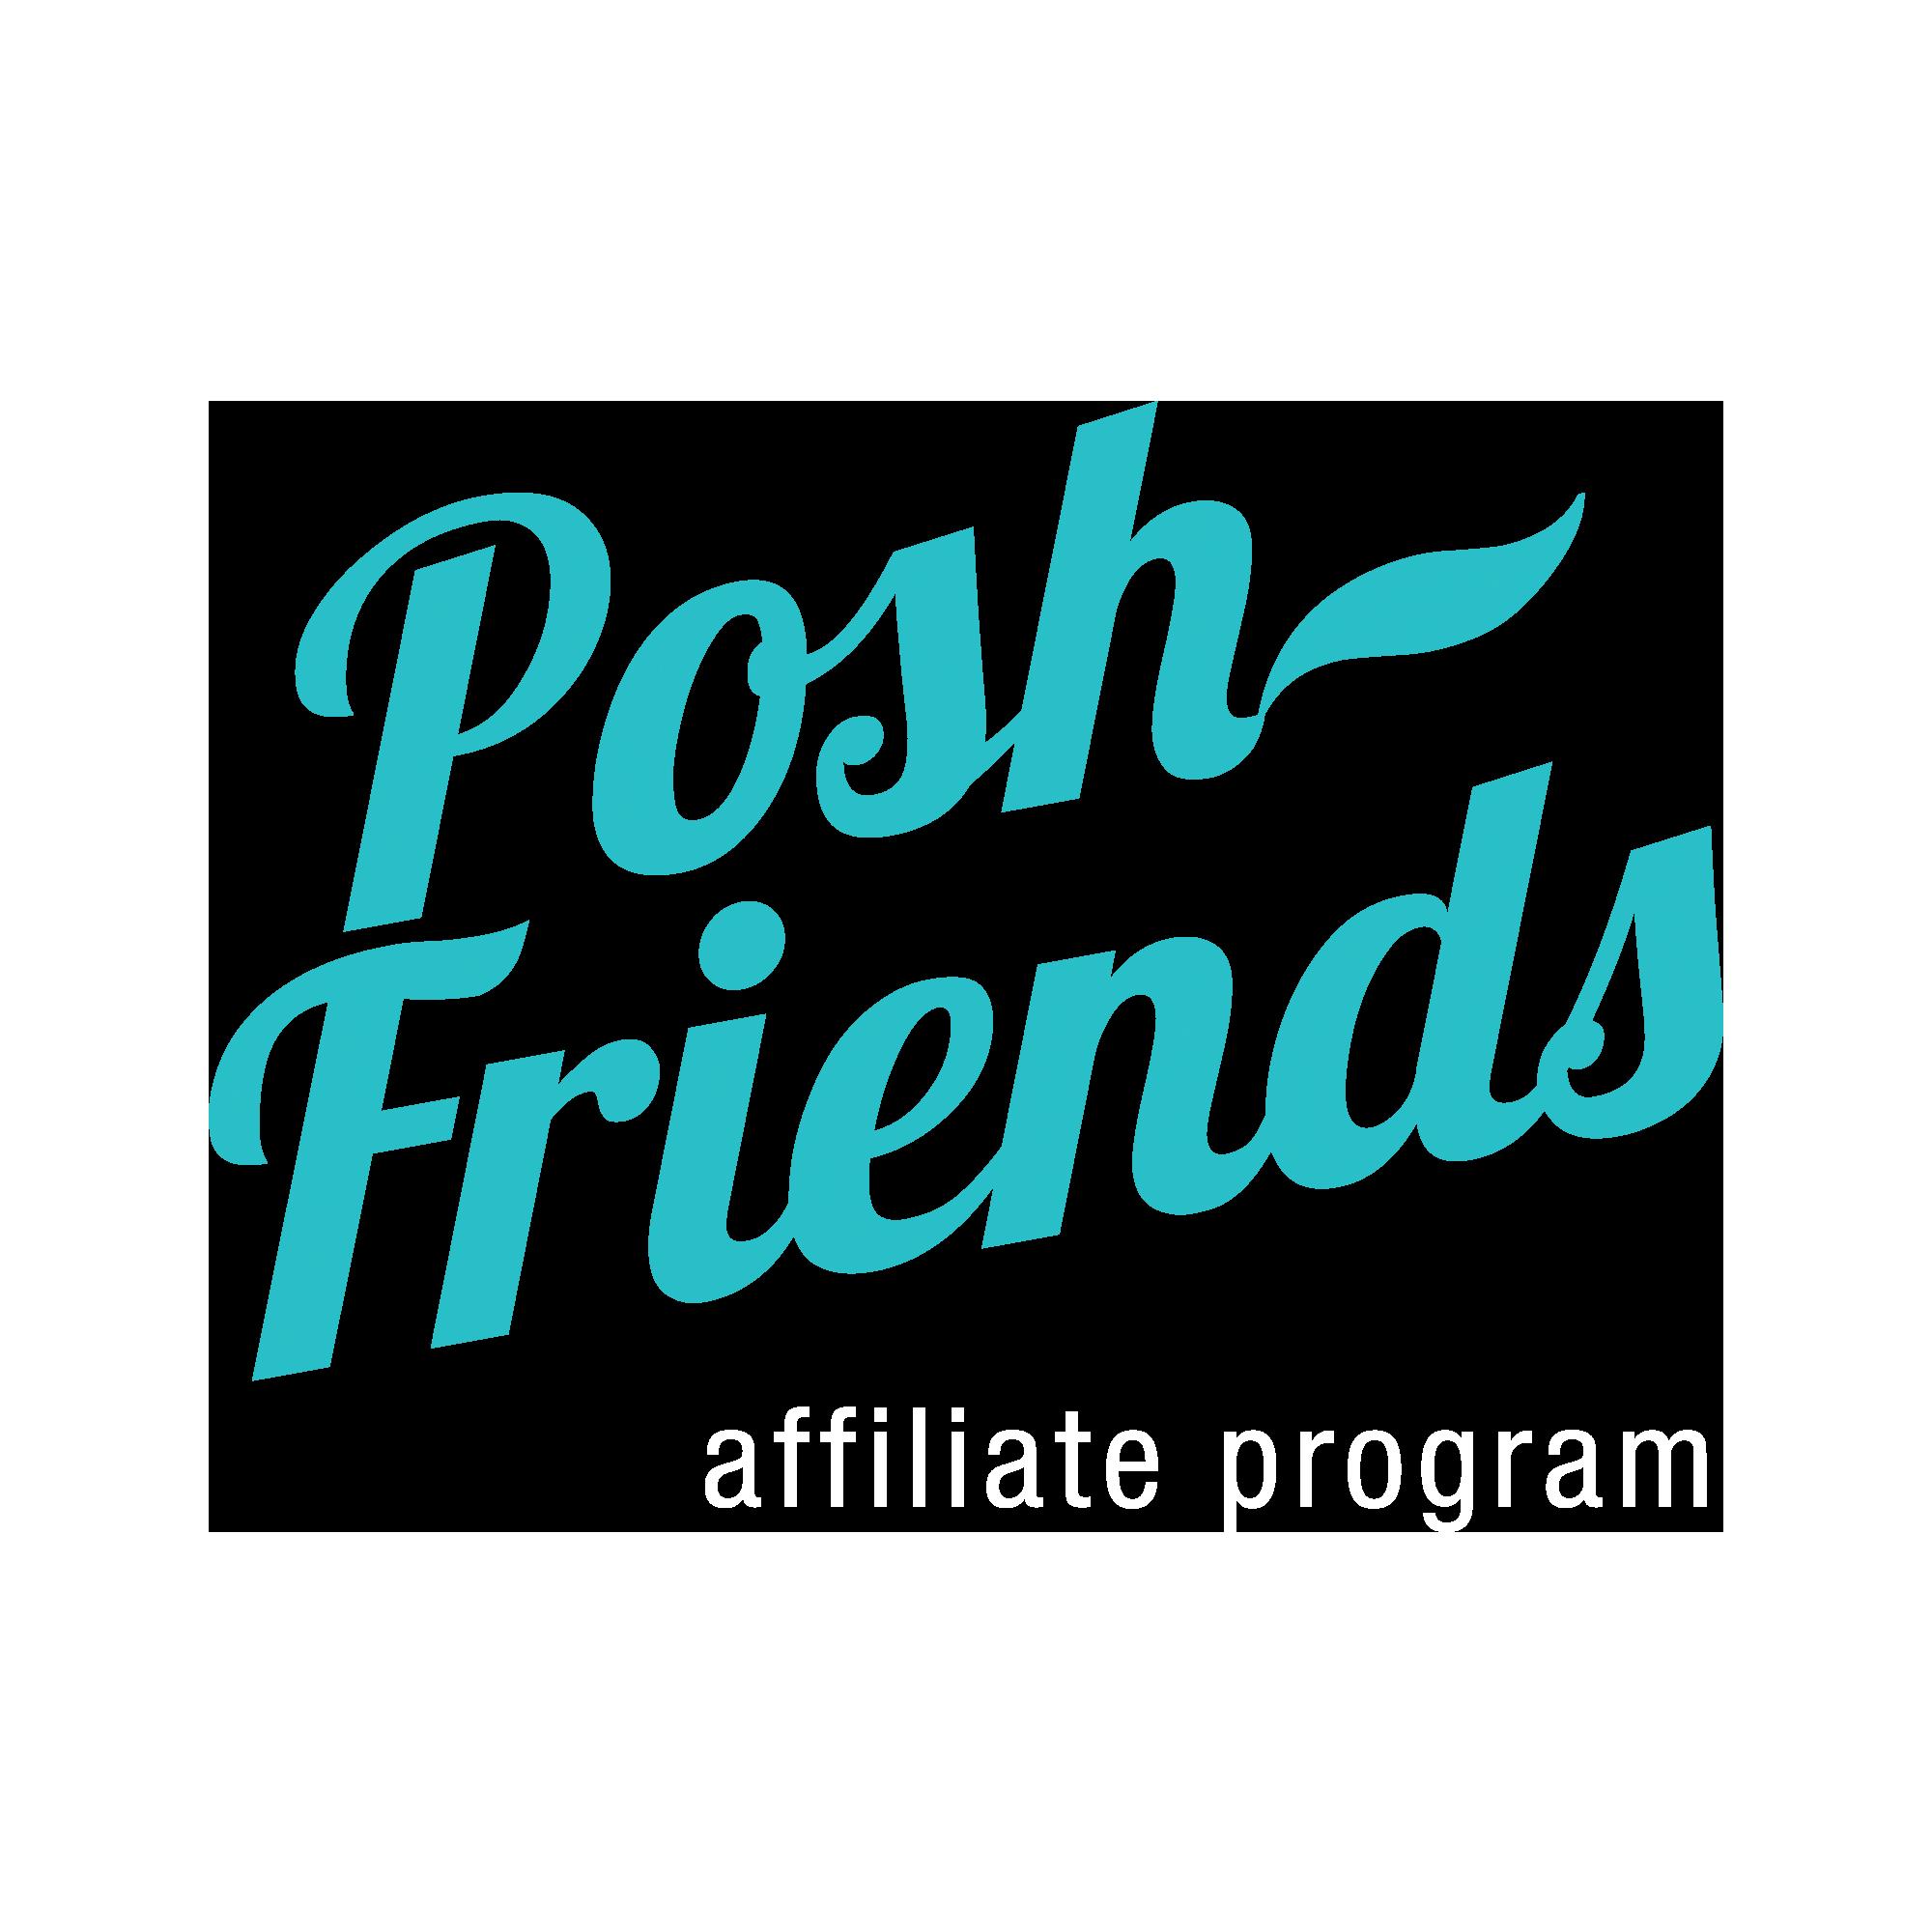 2000x2000_posh_logo